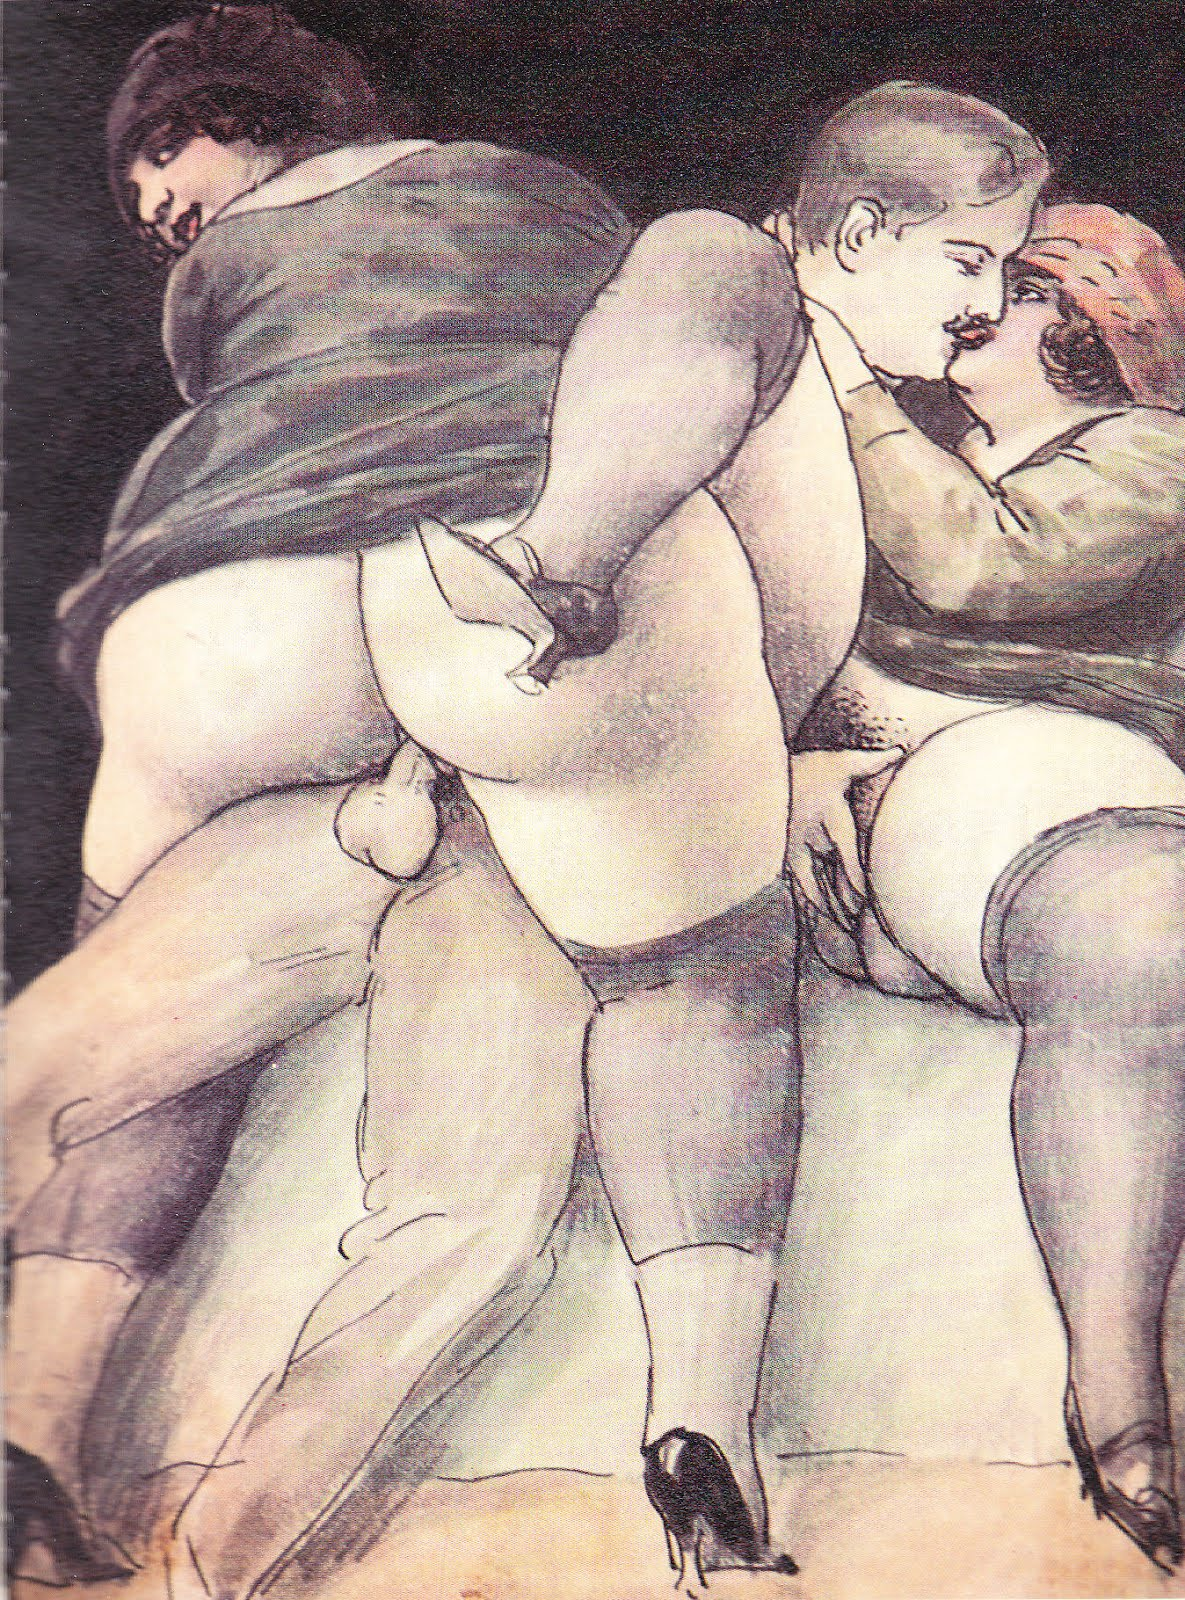 Erotic Drawings Hardcore